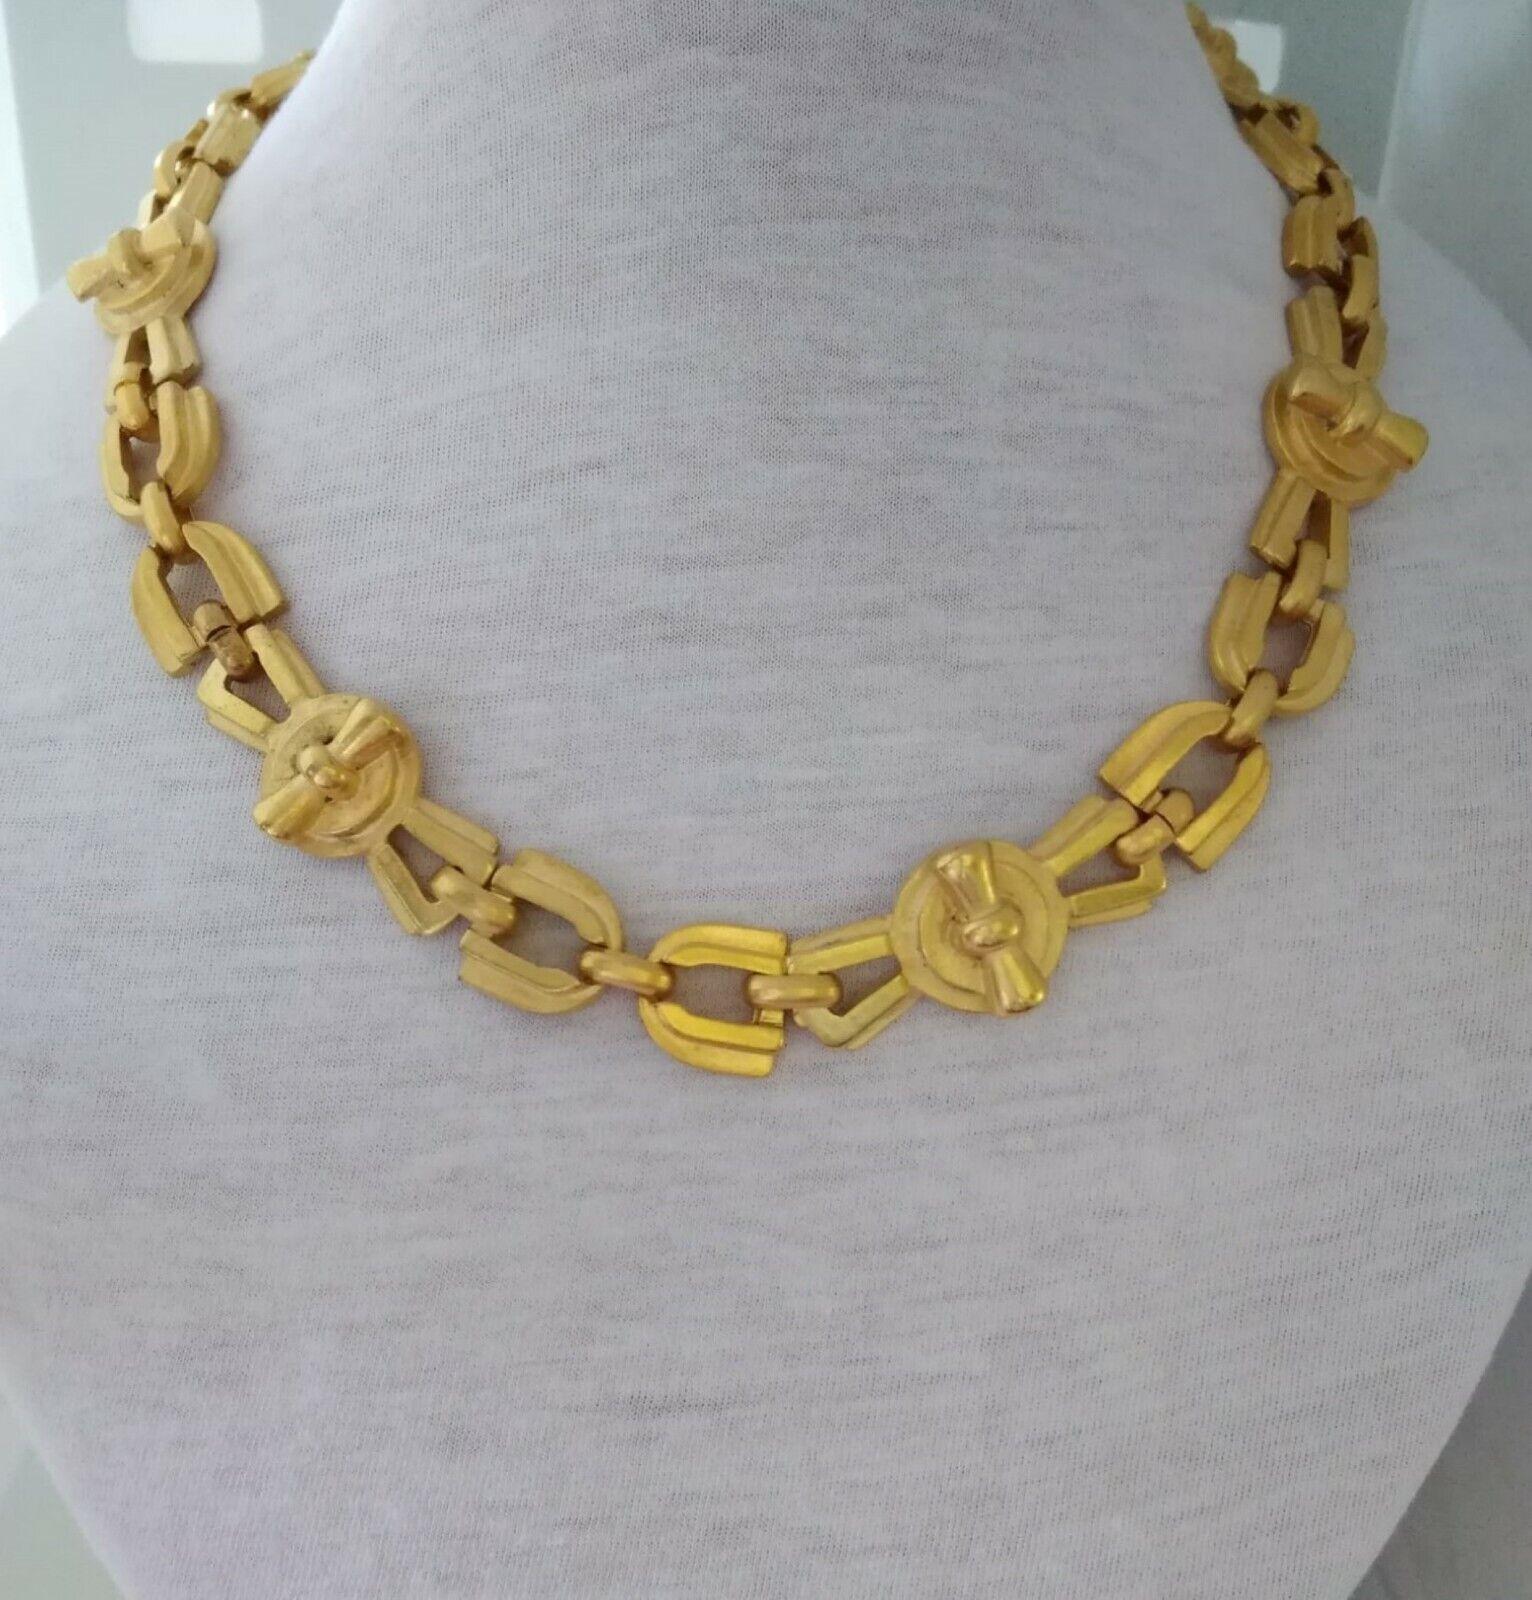 Vintage Design Italian Necklace Metal Gold Color and collanrino choker-show original title